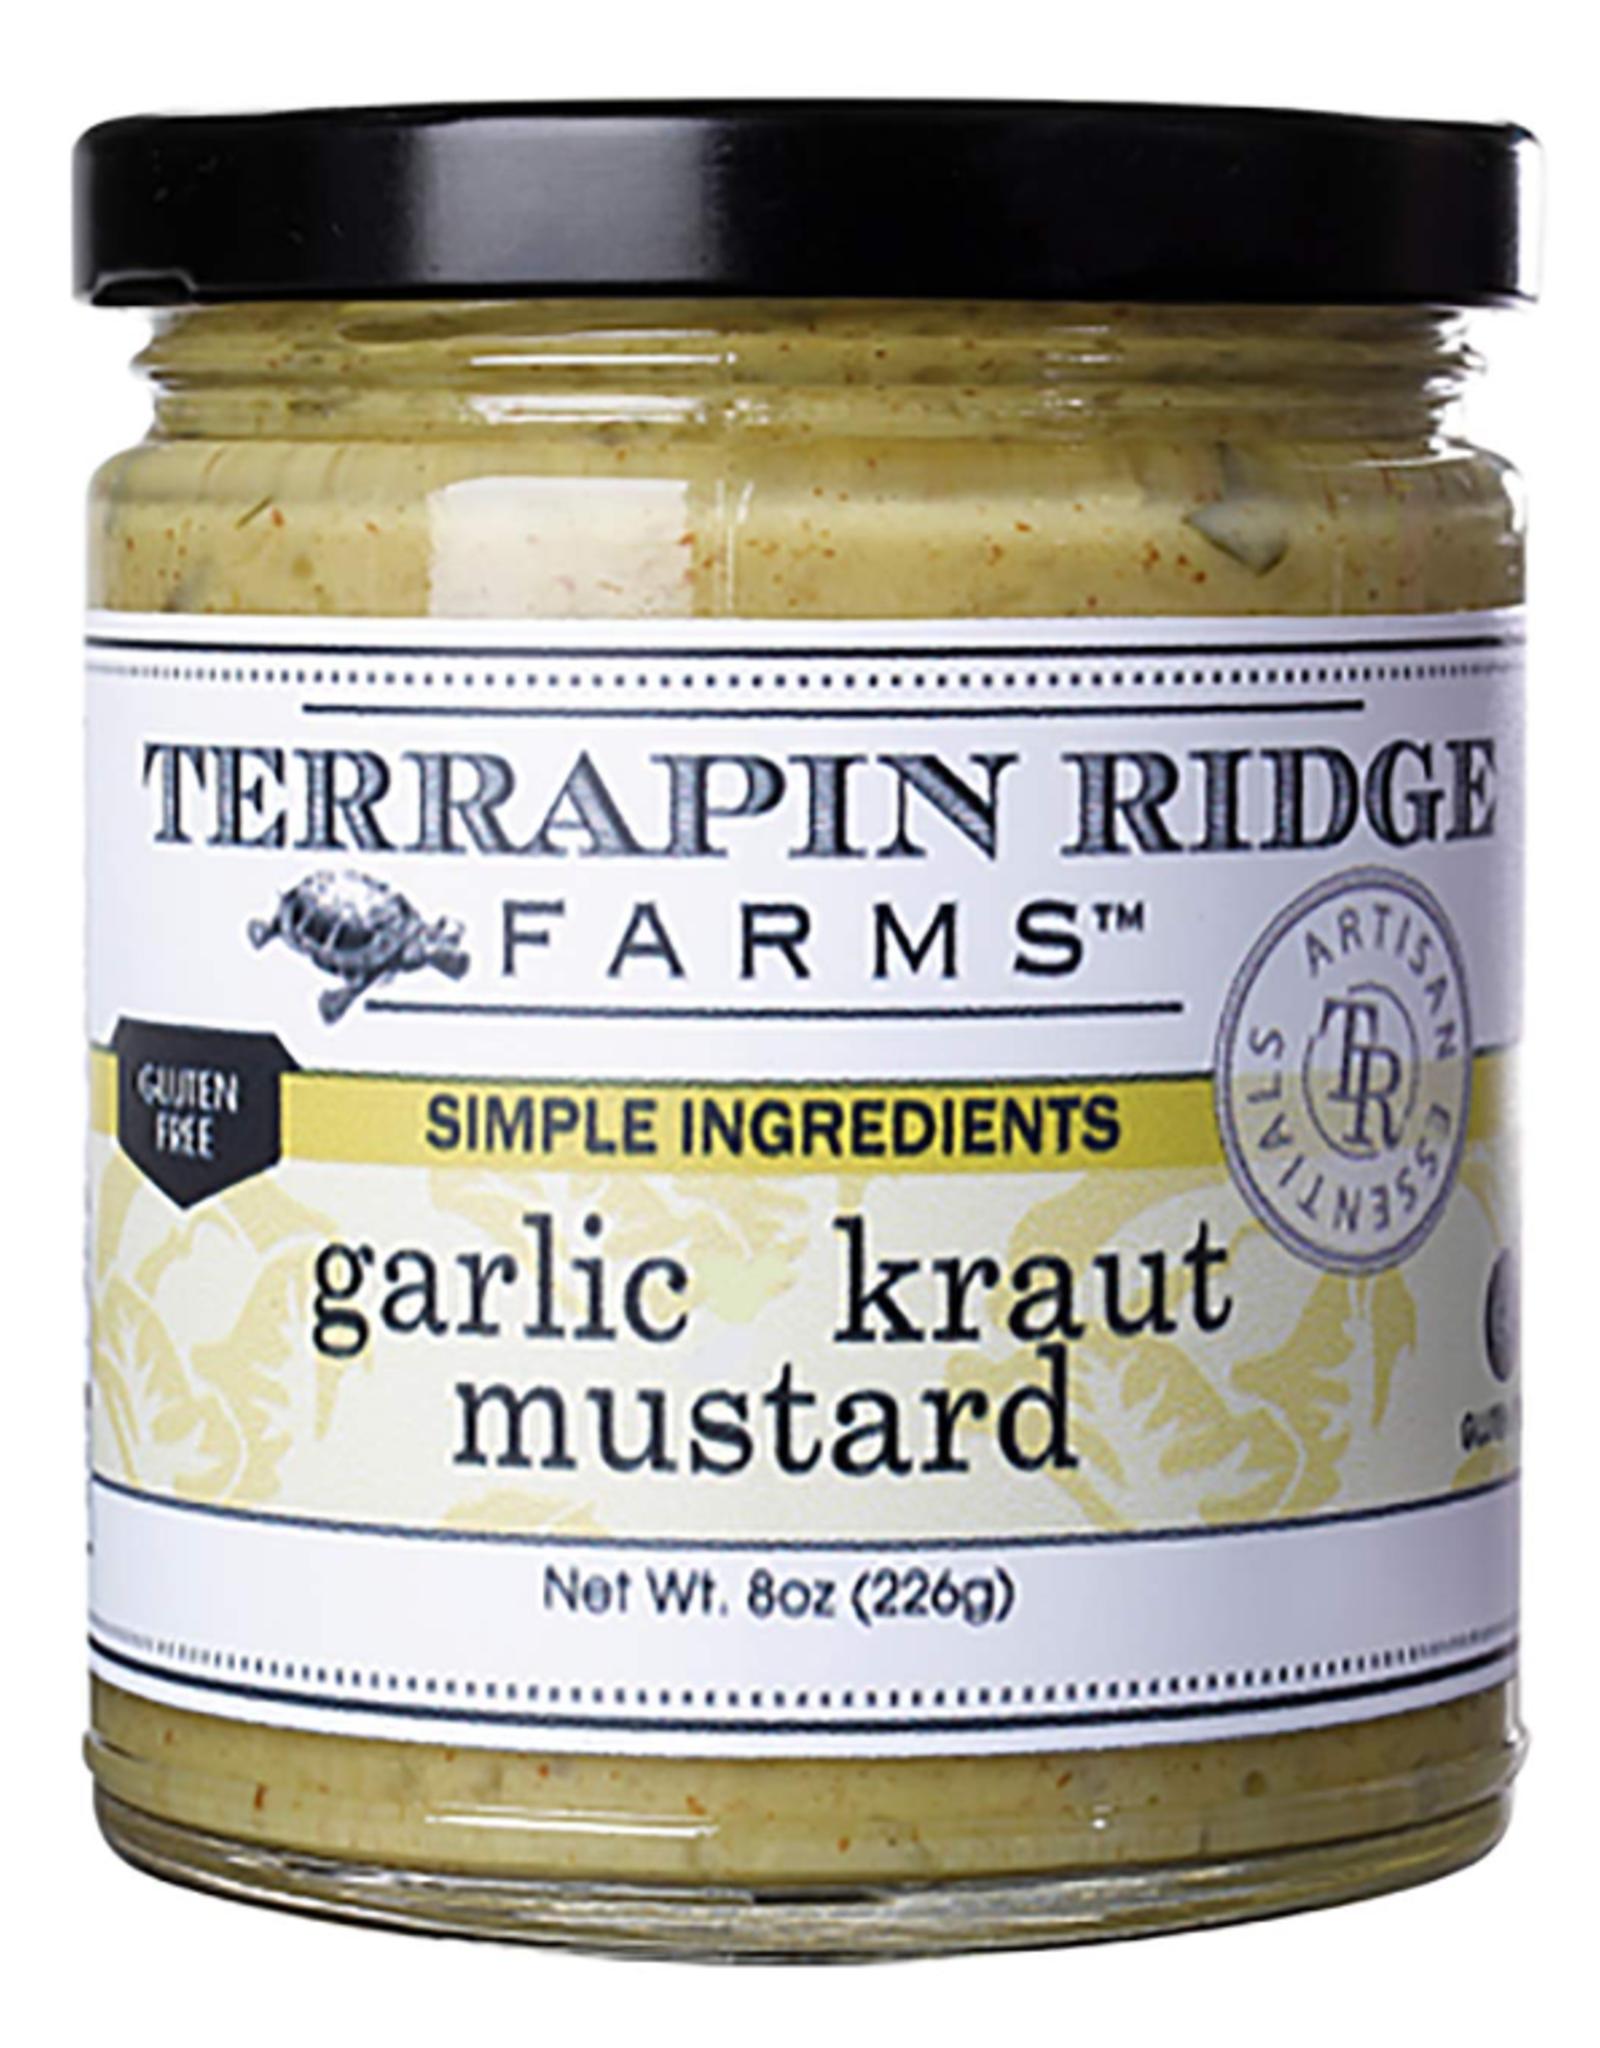 Terrapin Ridge Garlicky Kraut Mustard